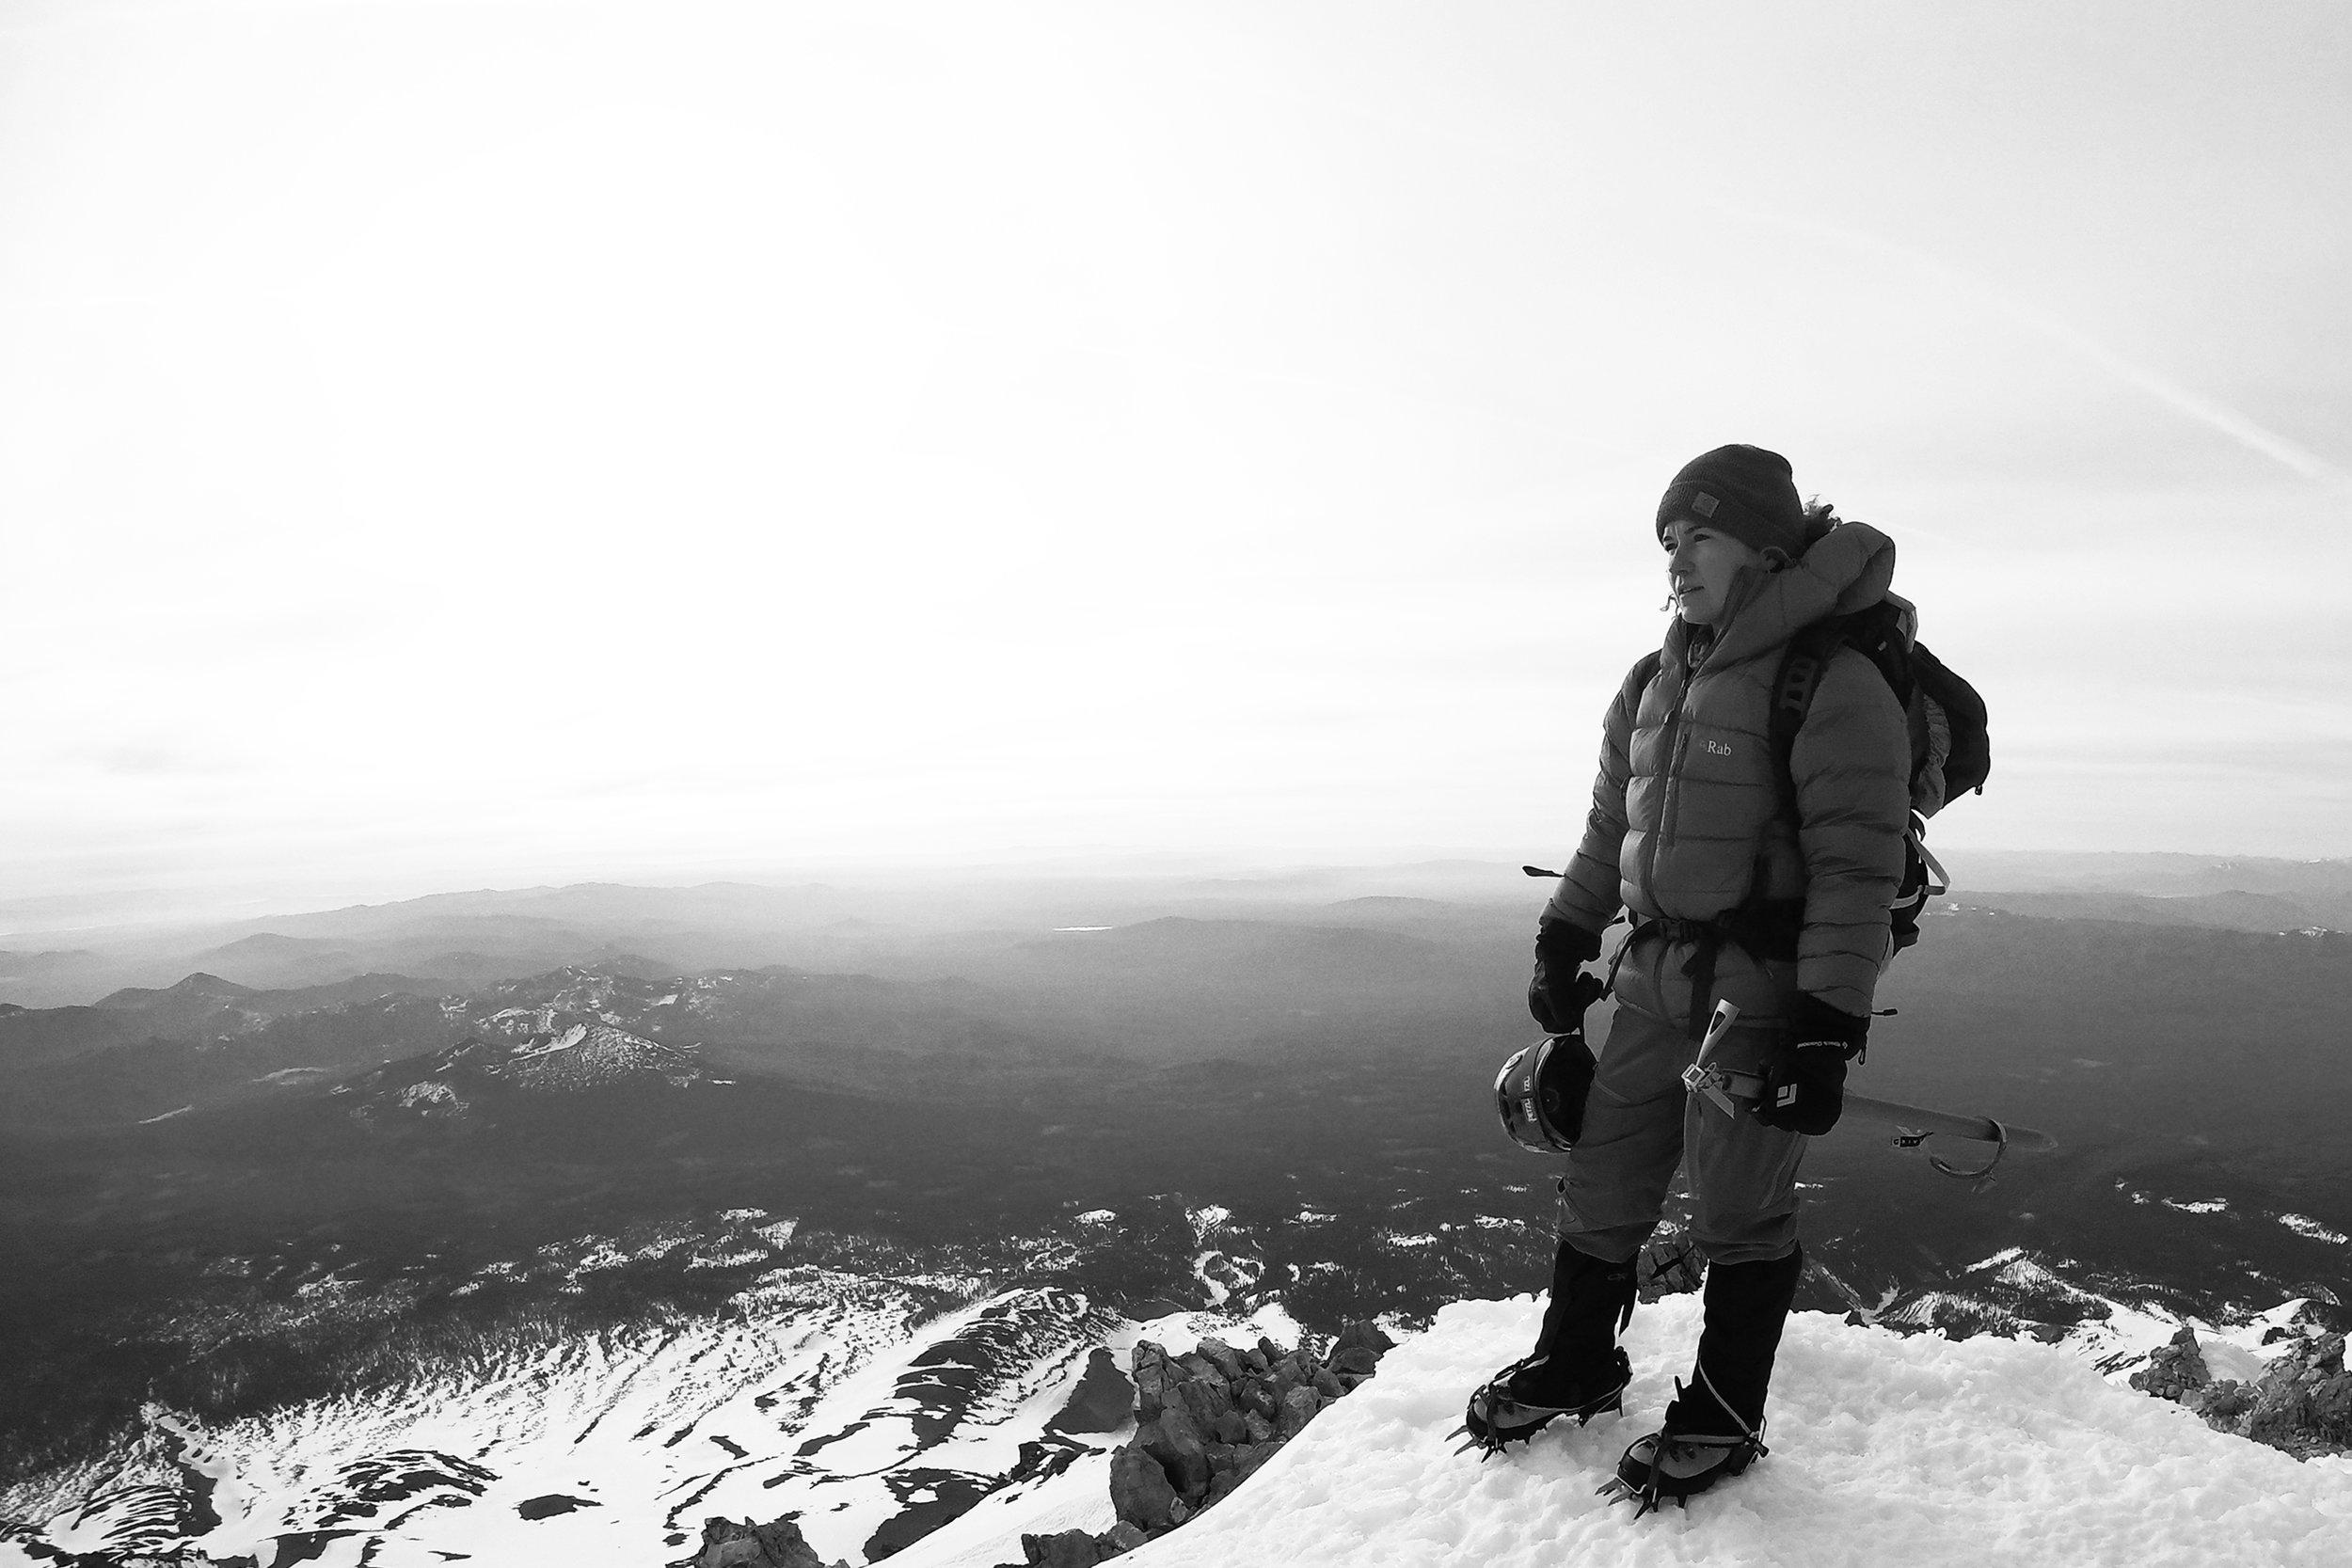 On the summit of Mt. Shasta, the second-tallest peak in the Cascade Range at 14,180 feet. | Photo by Jon Haas